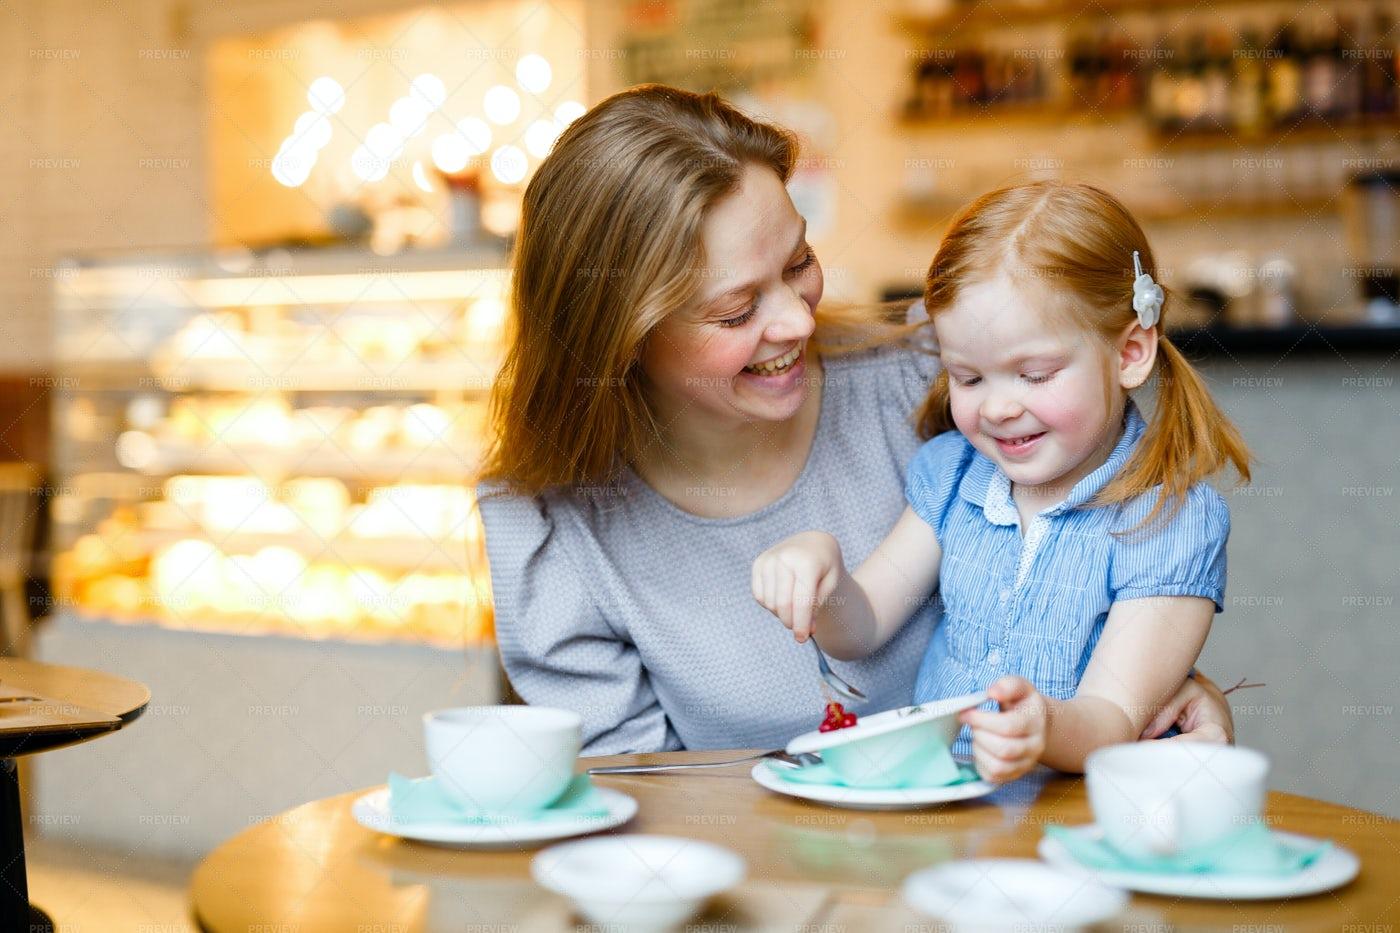 Dessert And Tea: Stock Photos